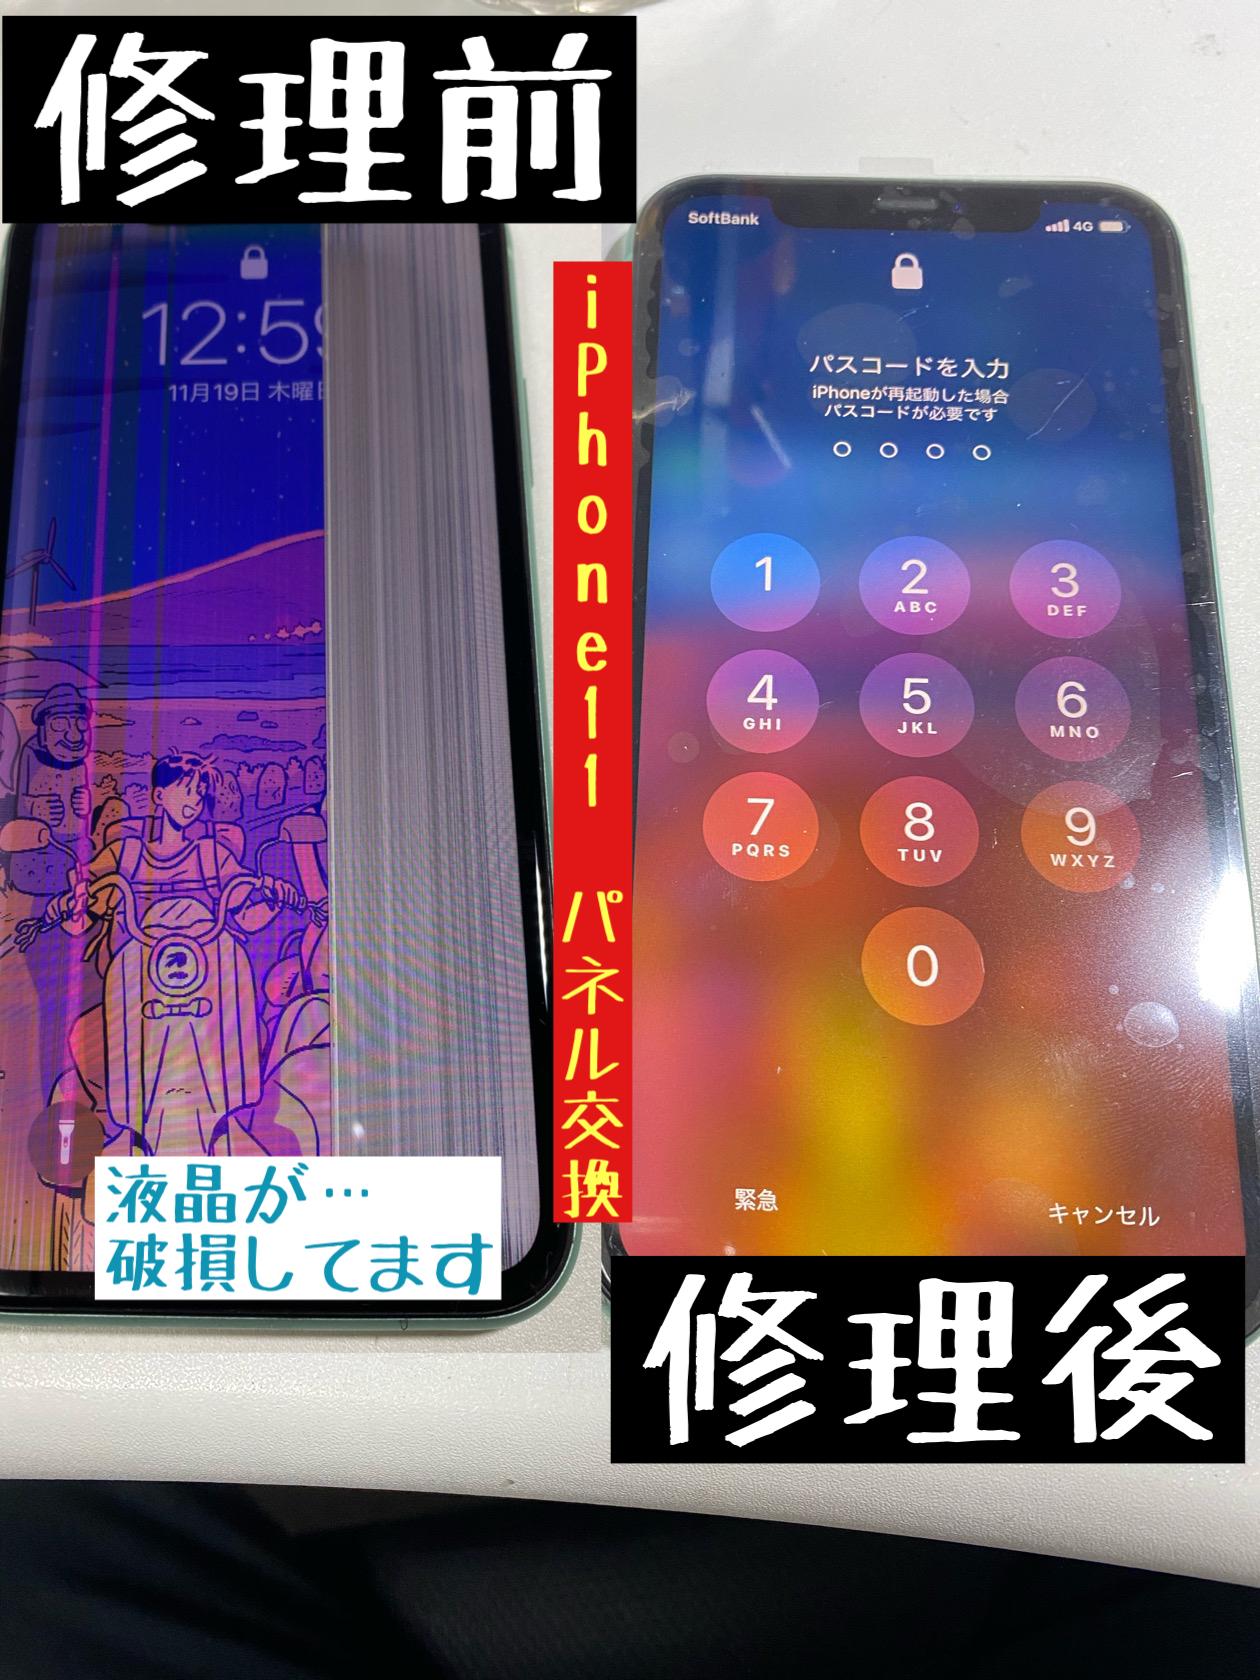 iPhone11 11PRO 11PROmax 画面修理 パネル交換 即日修理 可児市 鵜沼 岩倉市 江南 iPhone アイフォン